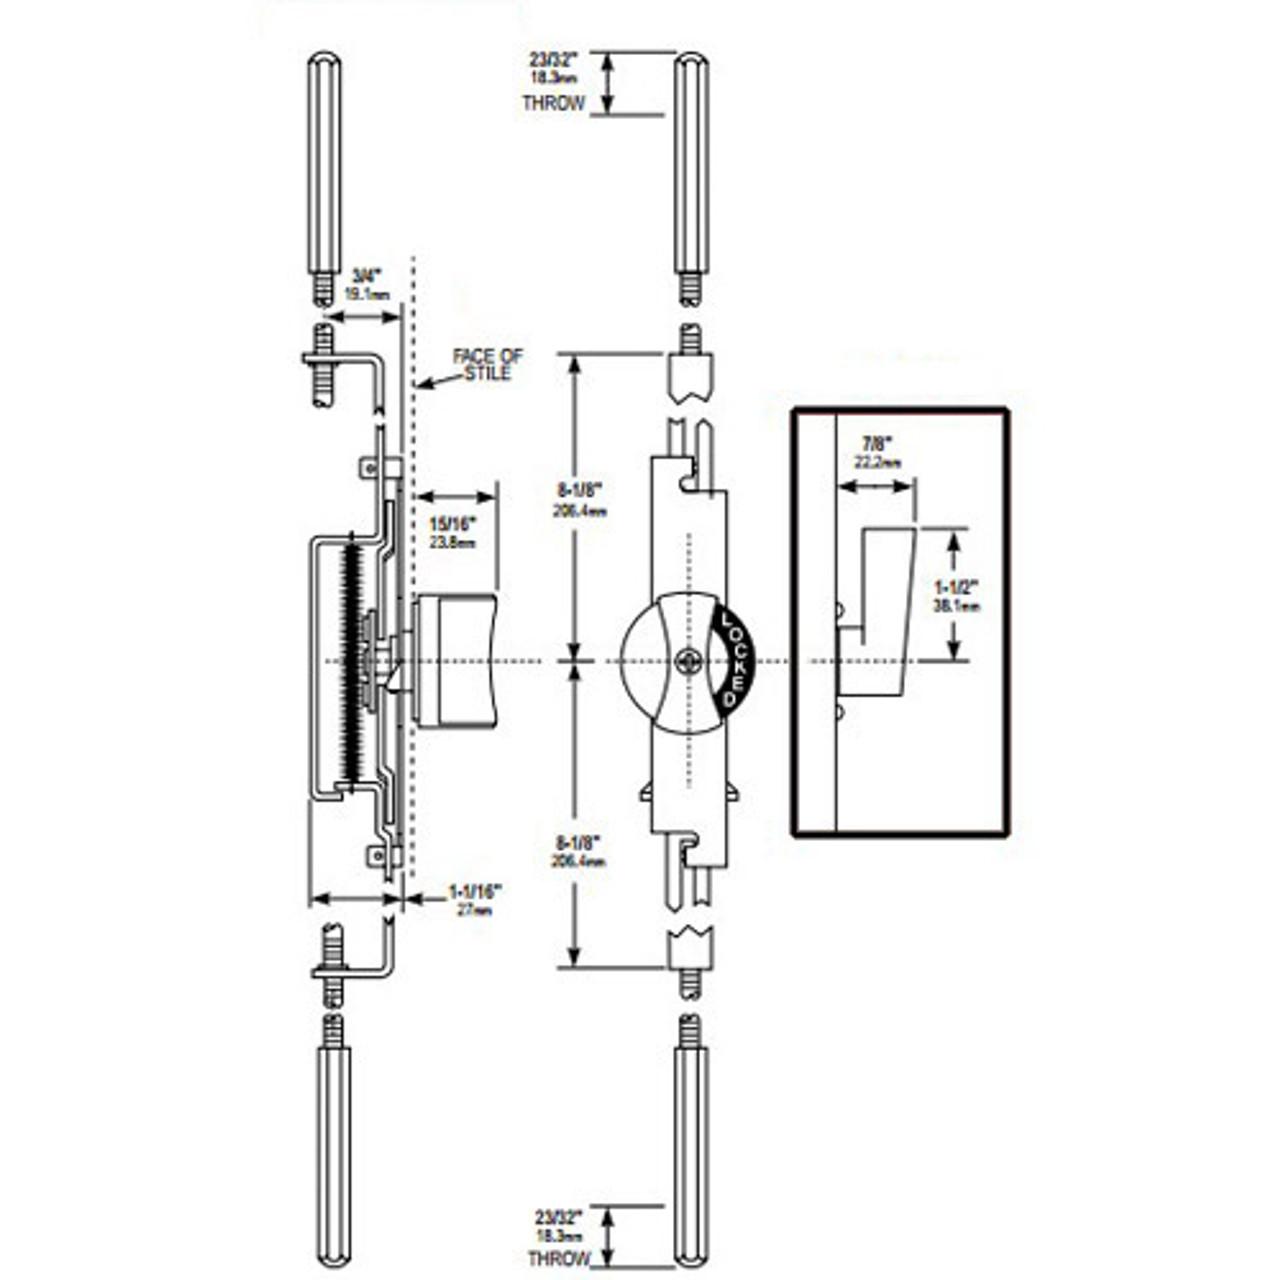 MS1881-01-682 Adams Rite Flushbolt Dimensional View